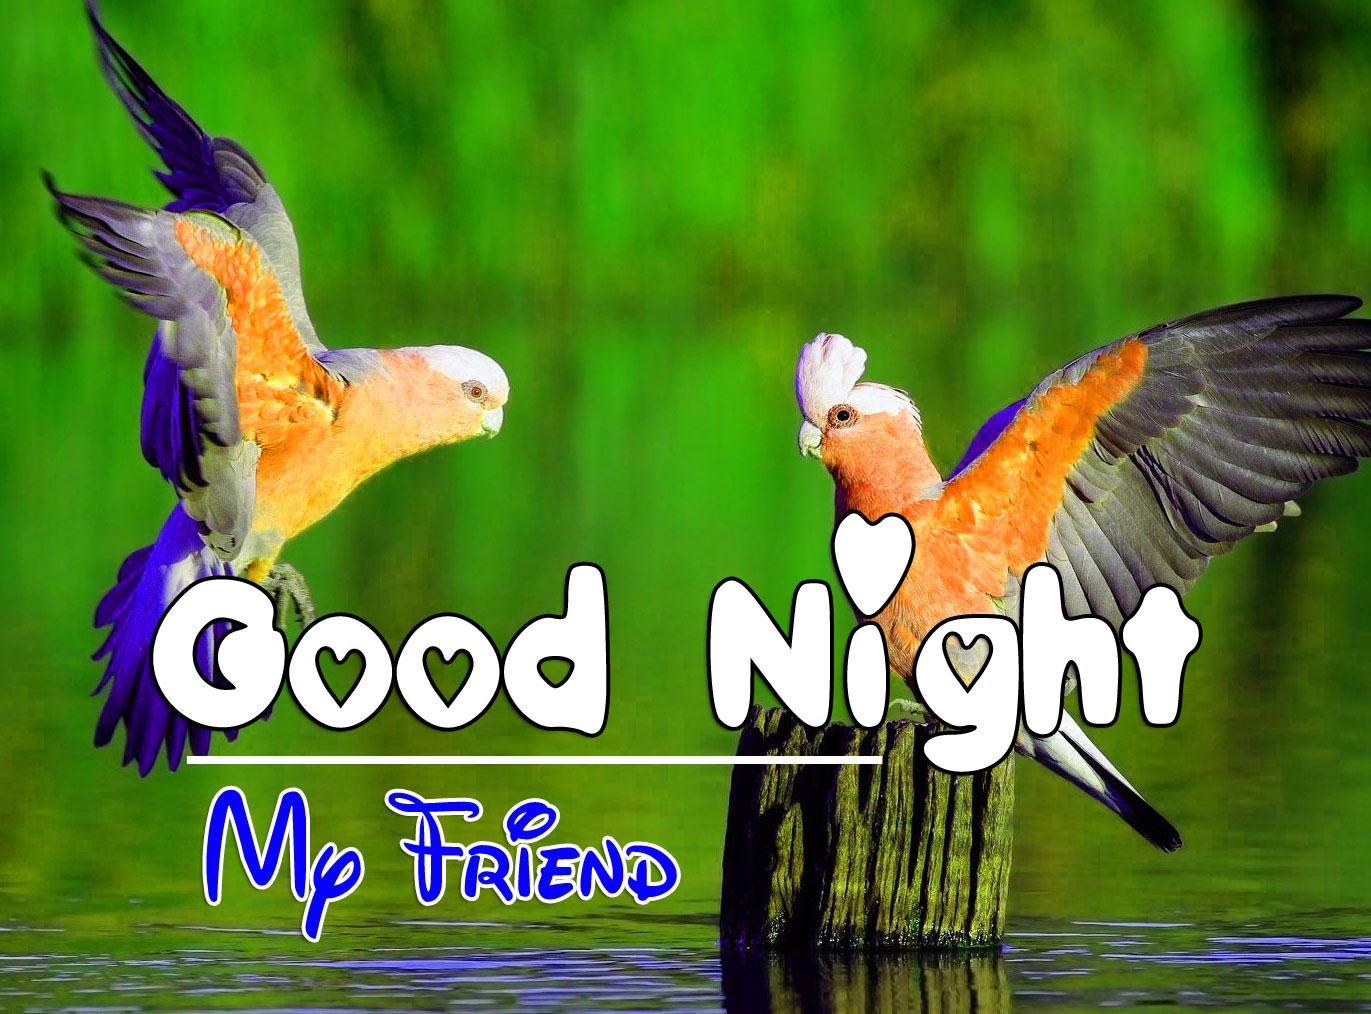 Good Night Wallpaper Images FRee